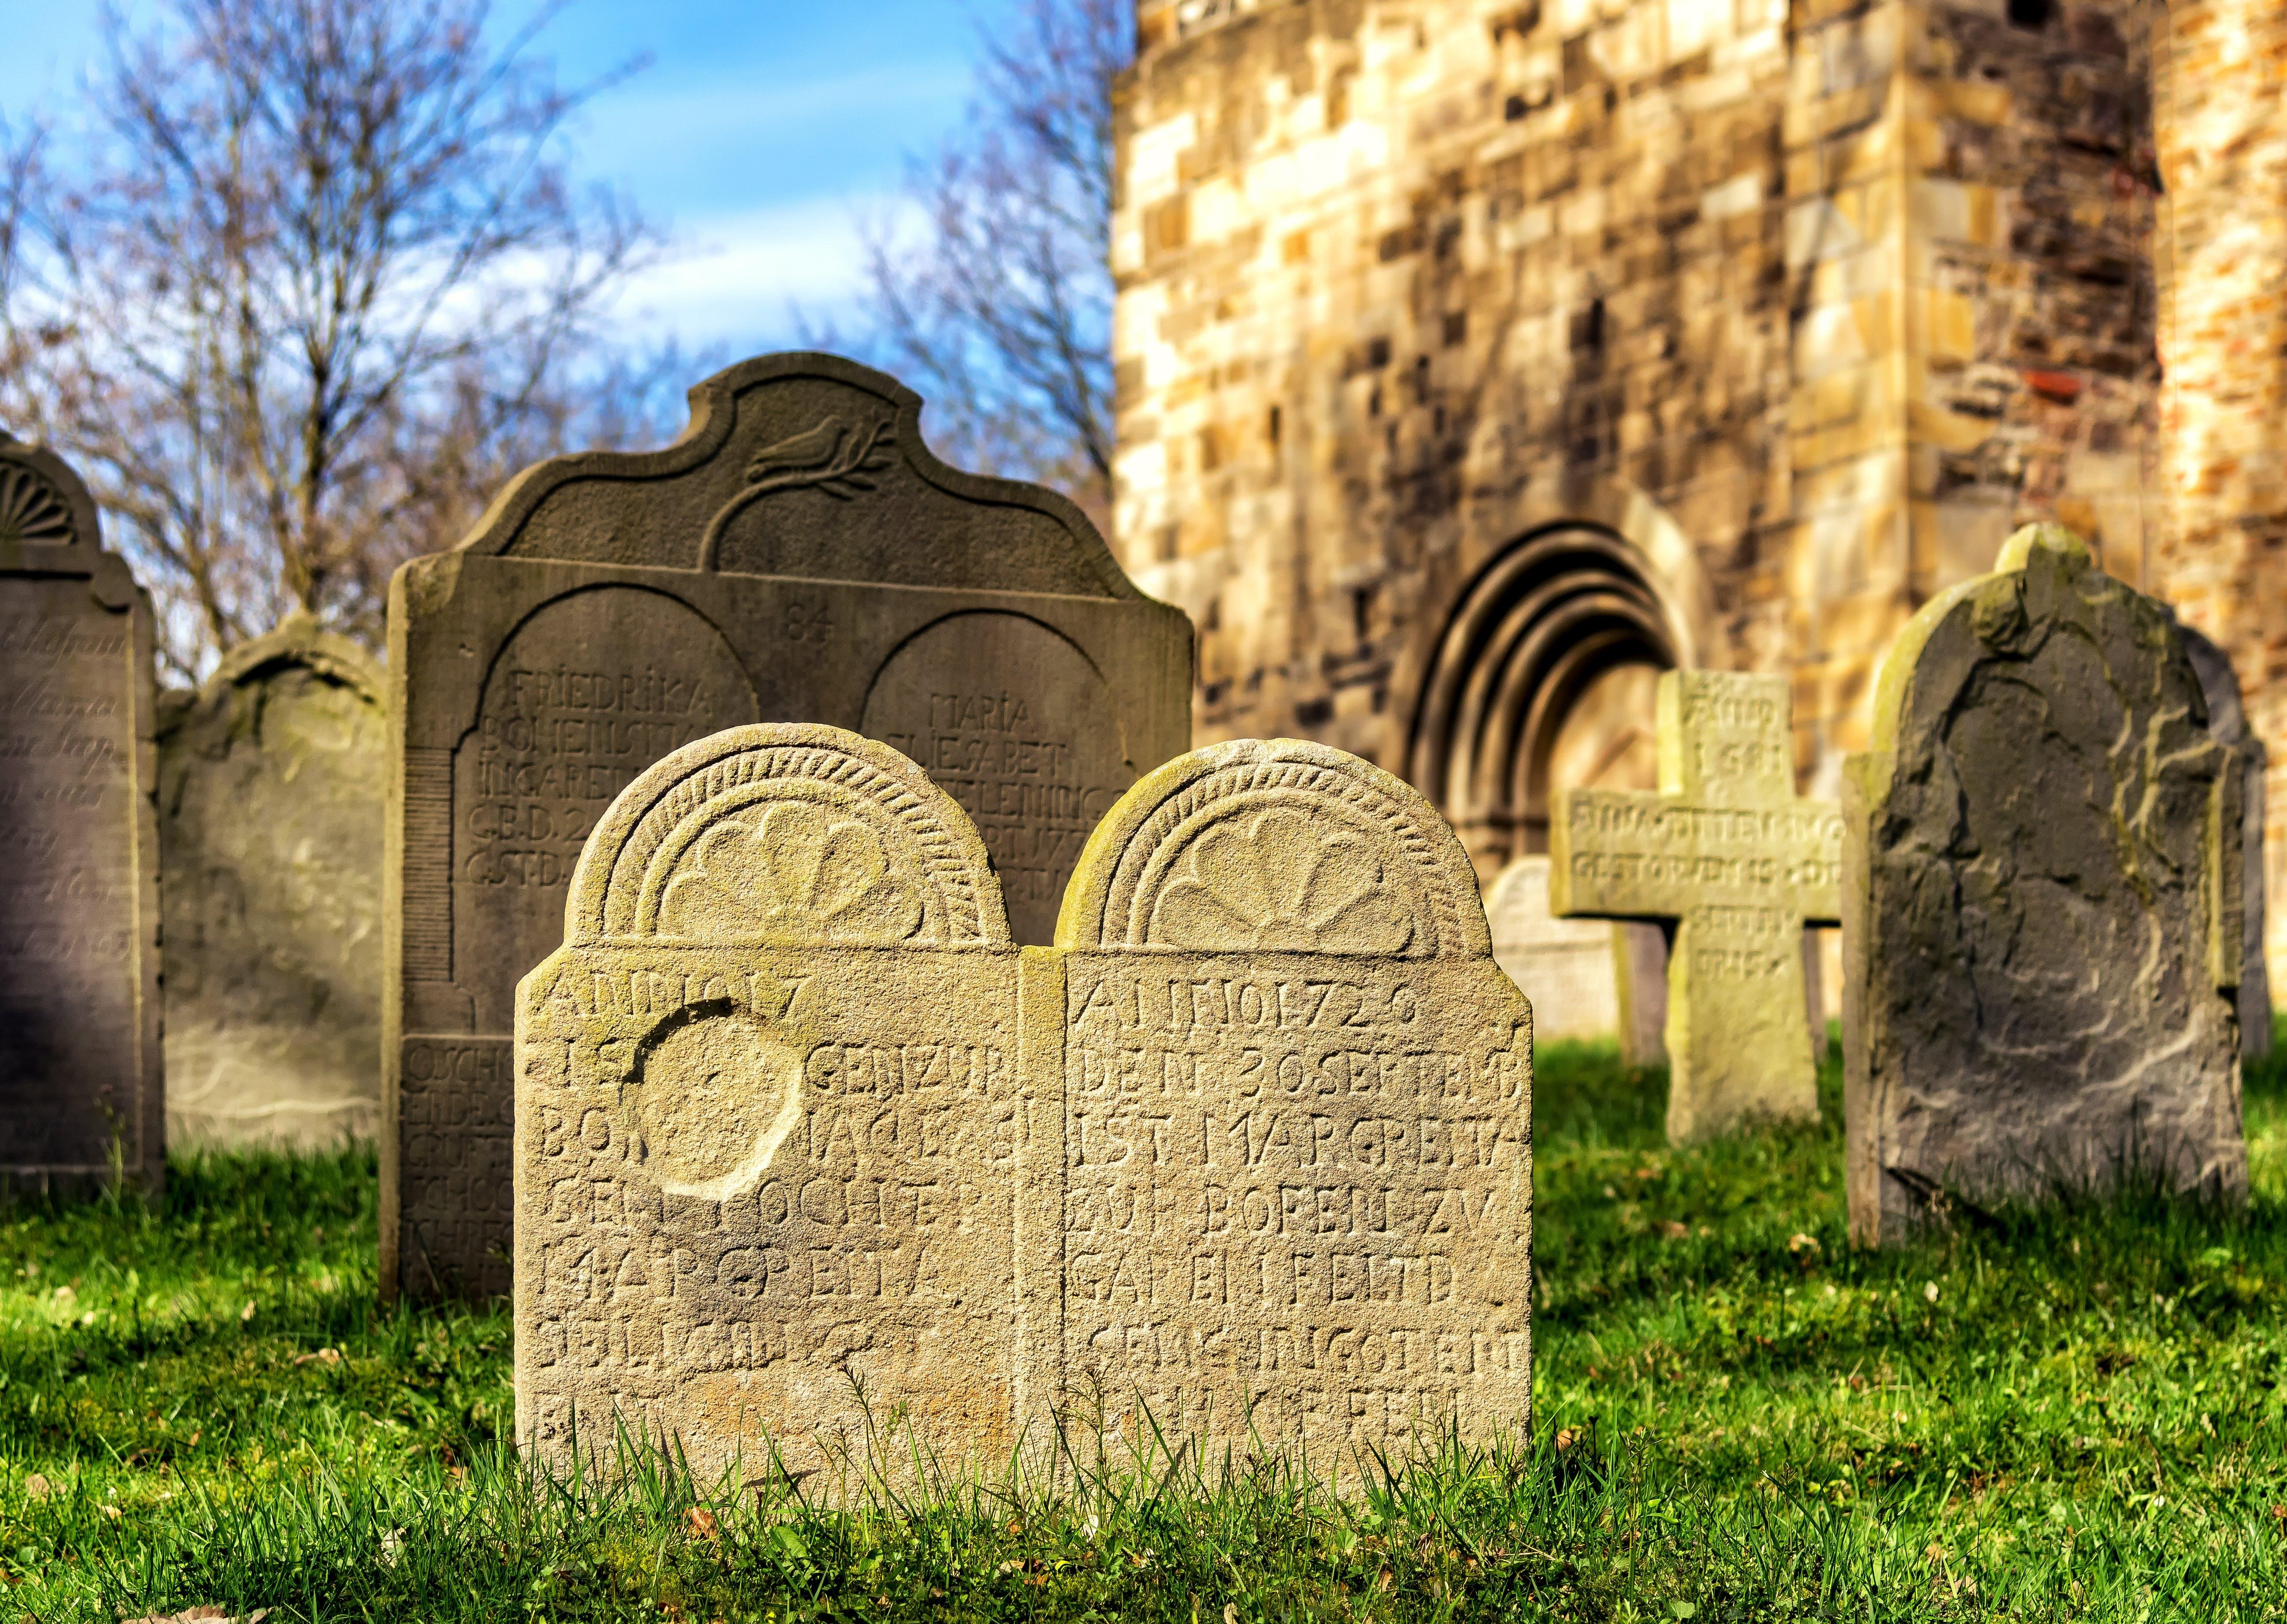 Gray Concrete Engrave Text Tomb